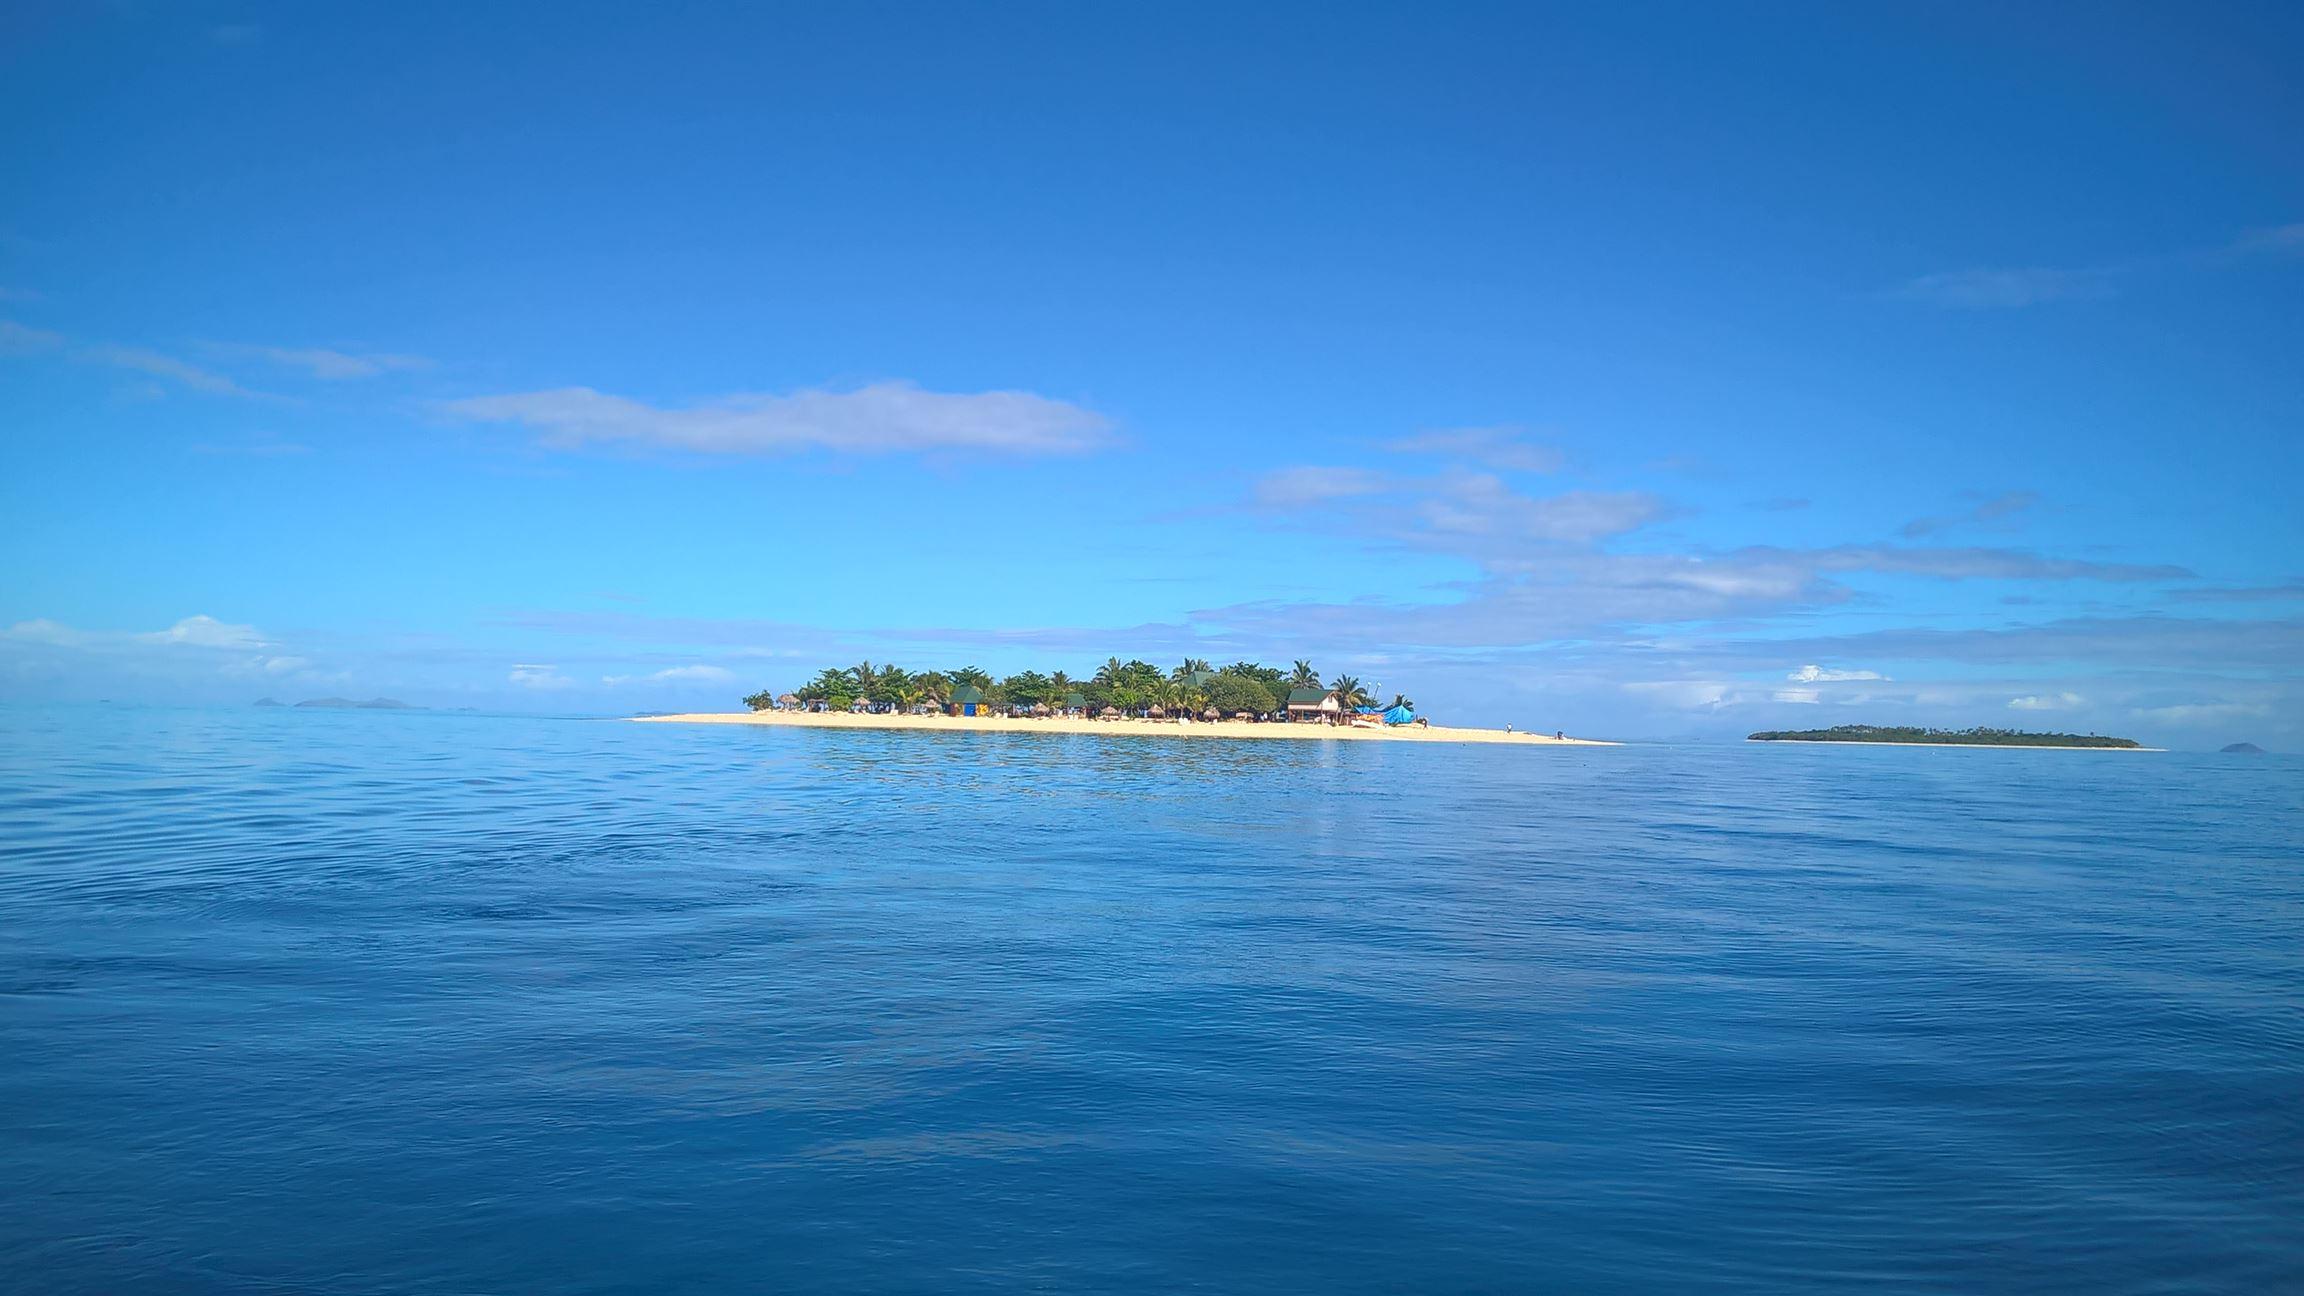 Meine erste Insel: South Sea Island